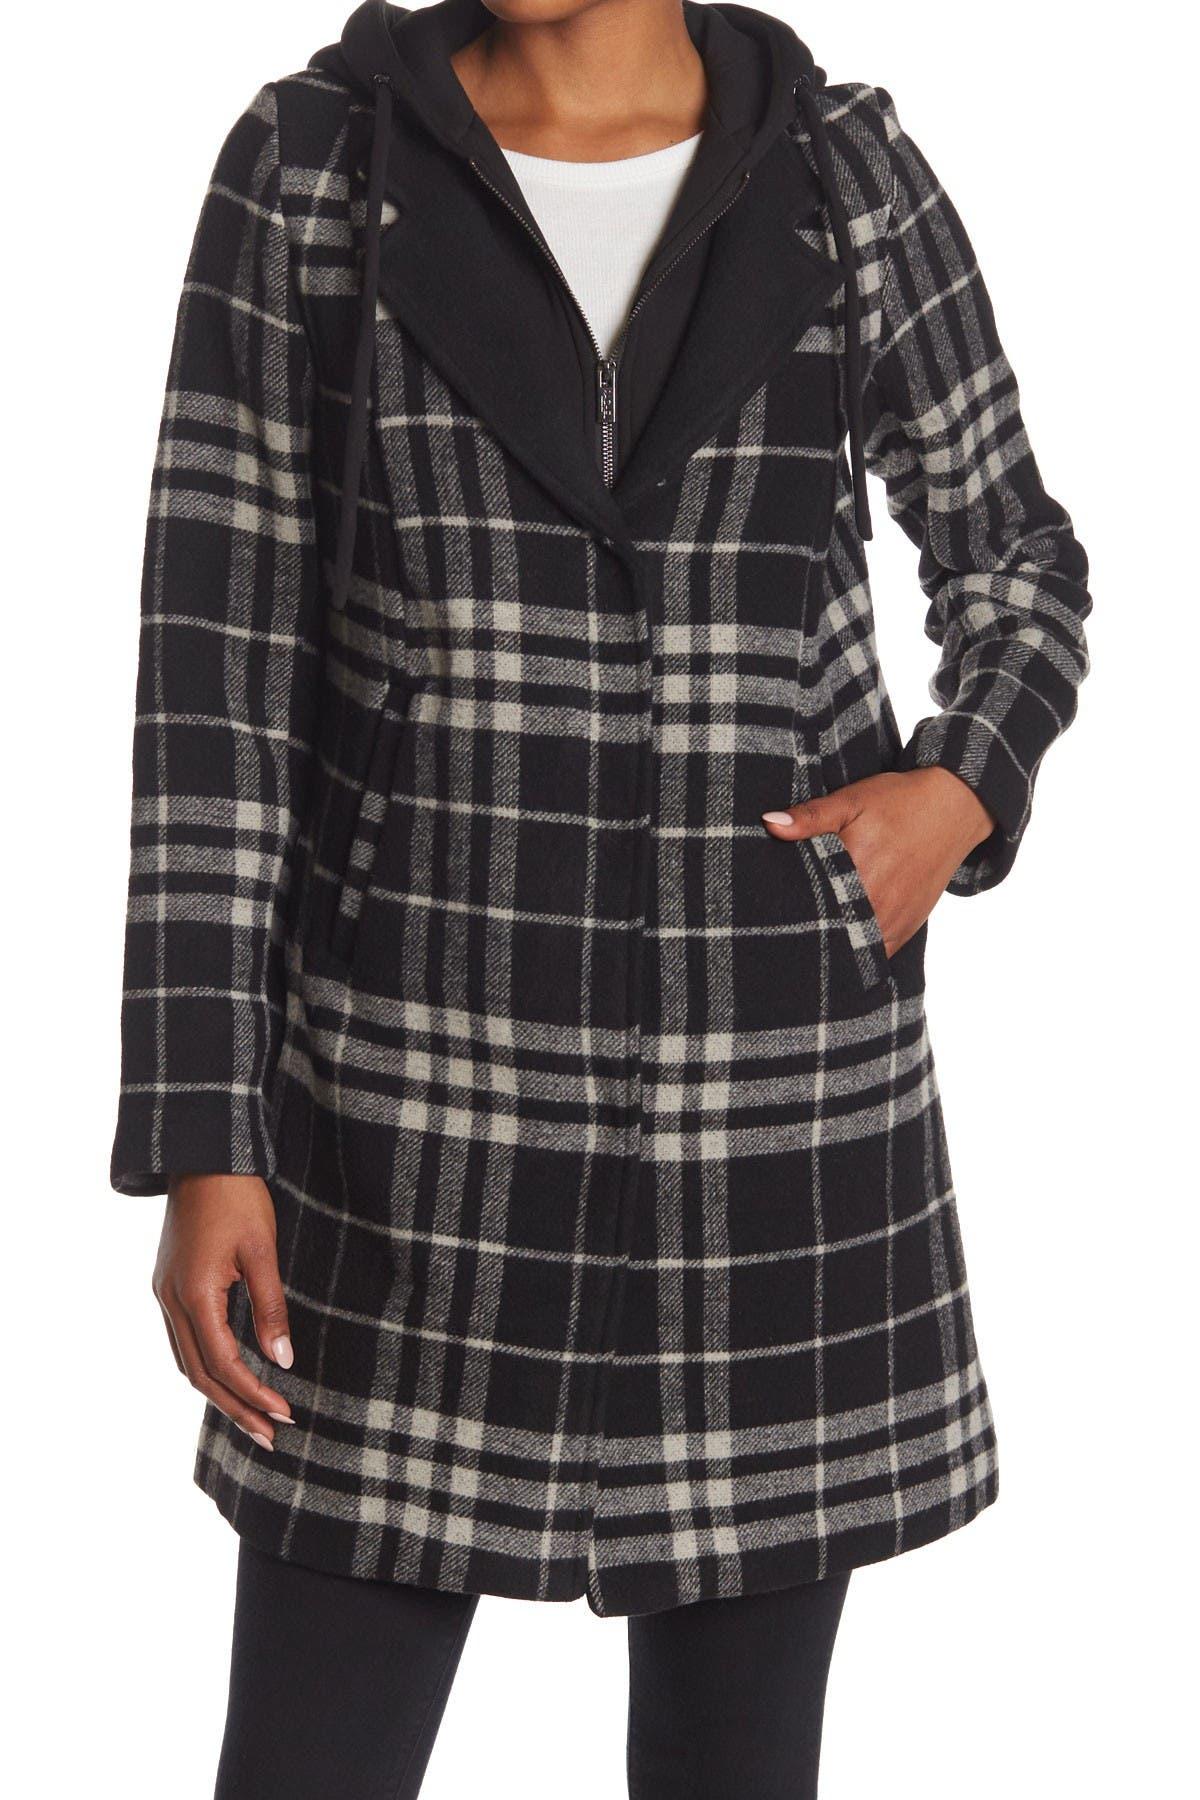 Image of RACHEL Rachel Roy Plaid Hooded Wool Coat